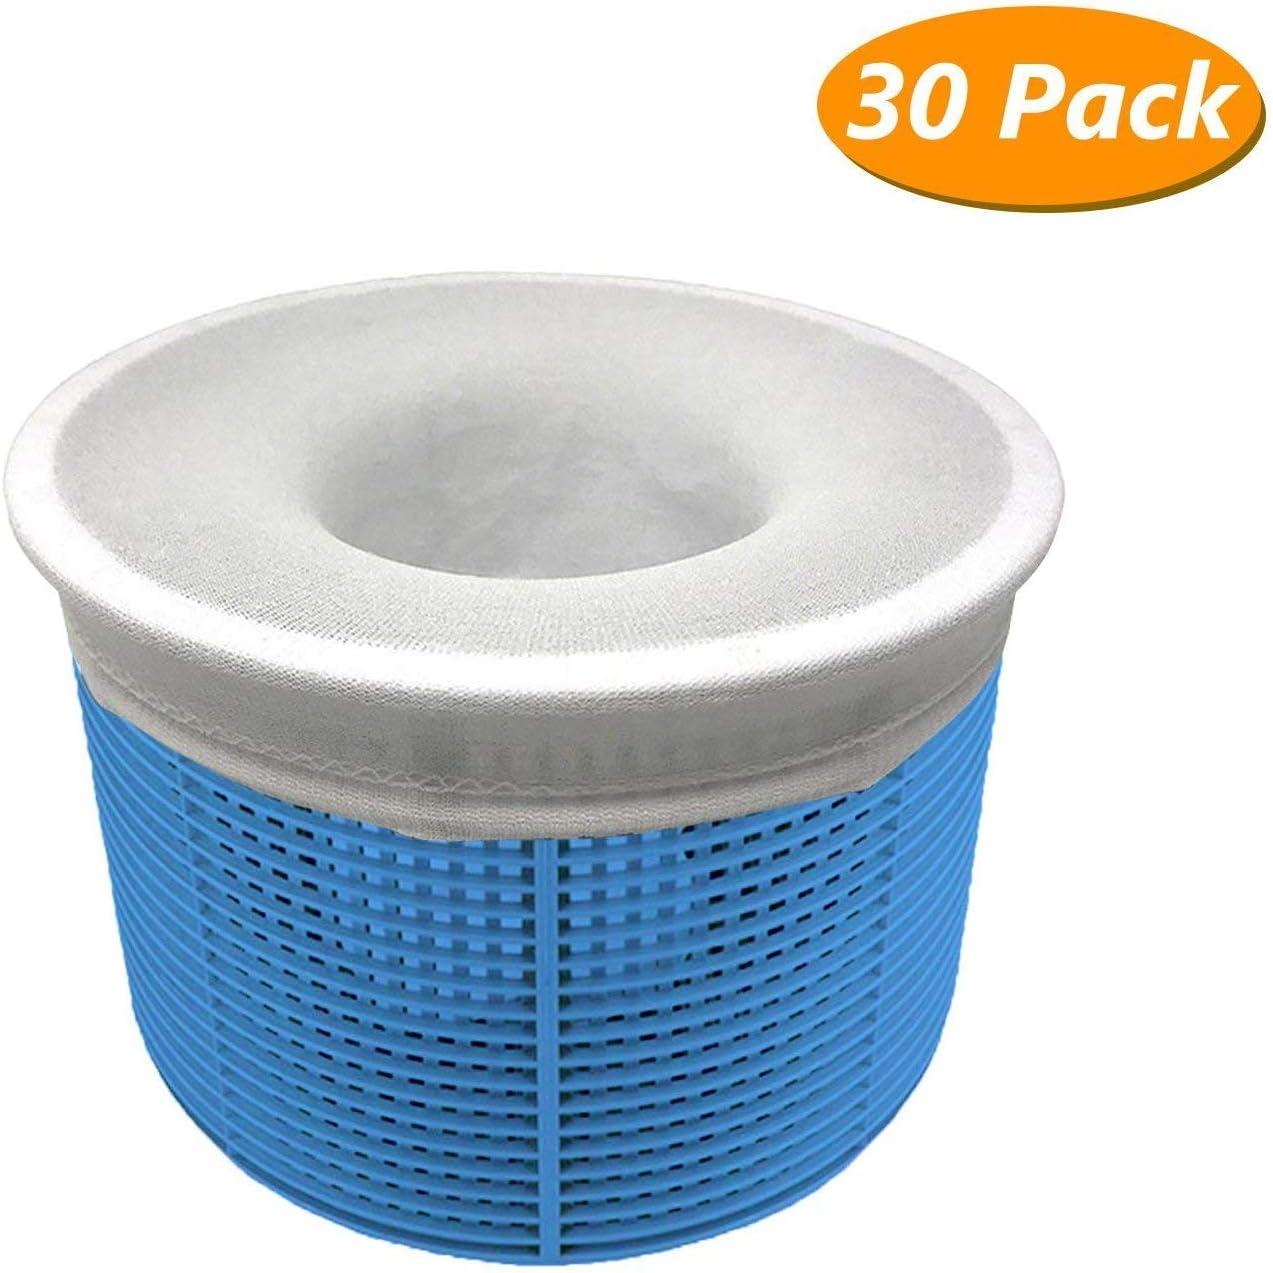 Aiglam 30 Piezas Calcetines de Piscina, Calcetines Protectores para Filtros de Piscina para Cesta de Filtro Skimmer, Forro de Malla de Malla Ultra Fina para Cesta de Piscina